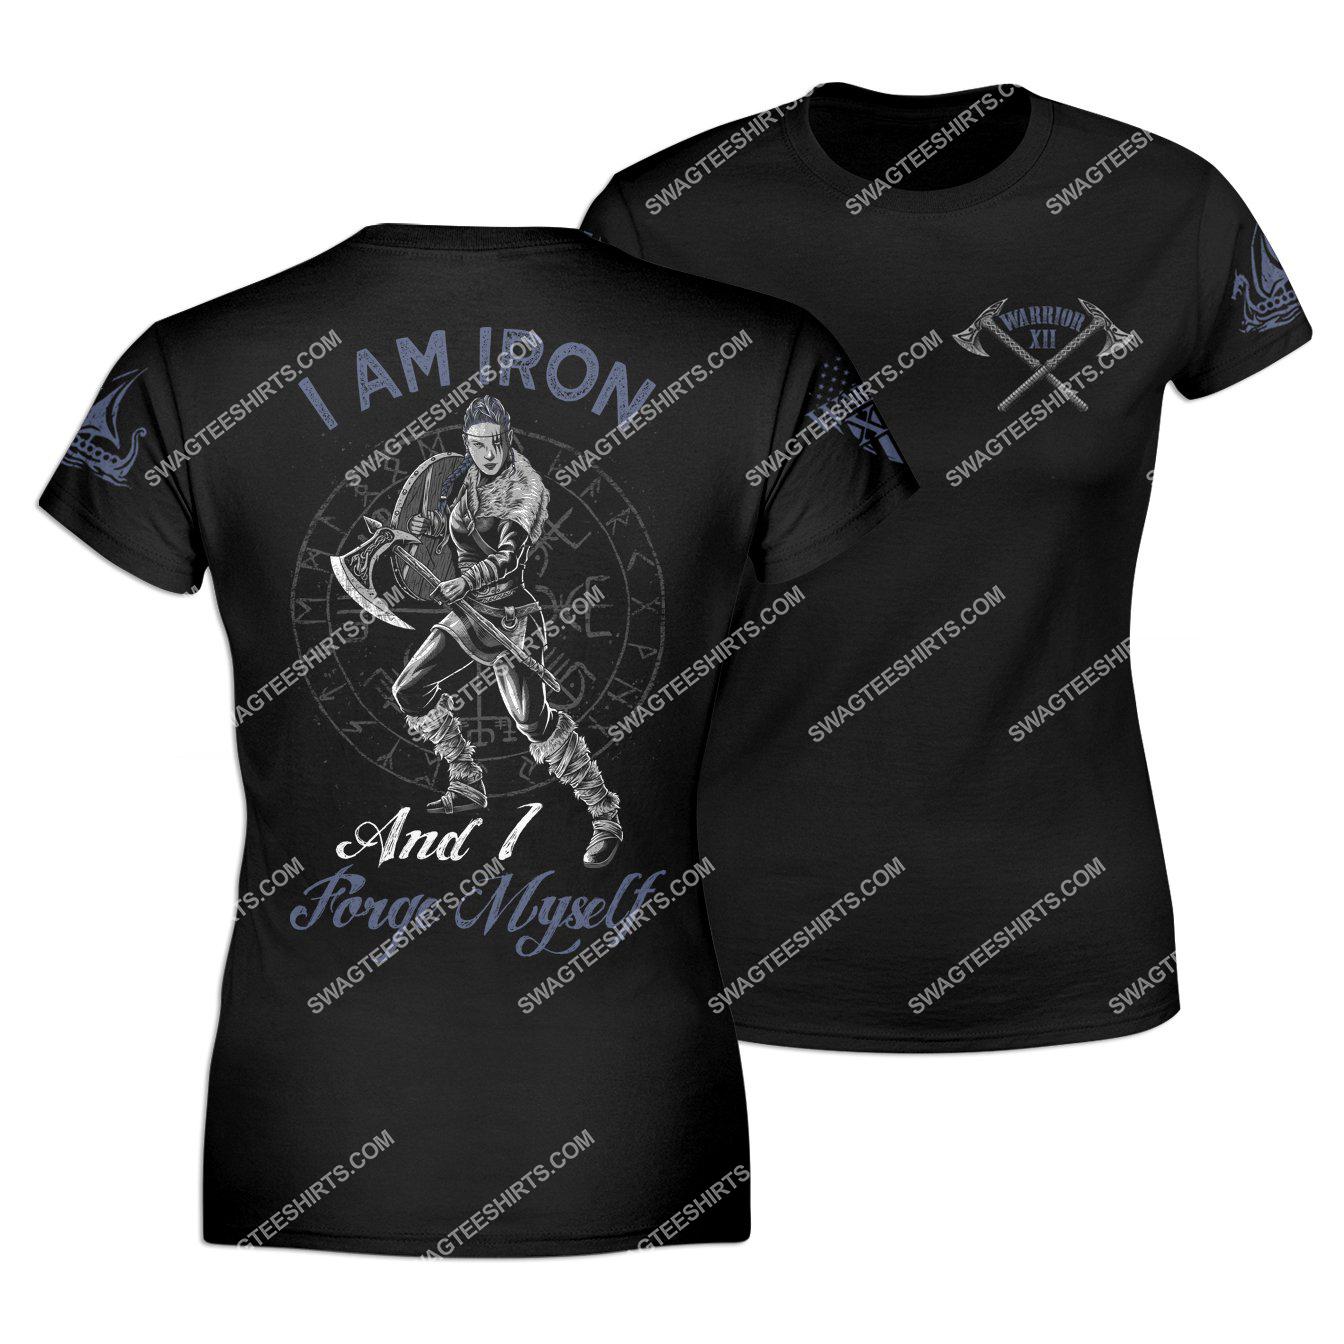 i am iron and i forge myself viking warrior shirt 1 - Copy